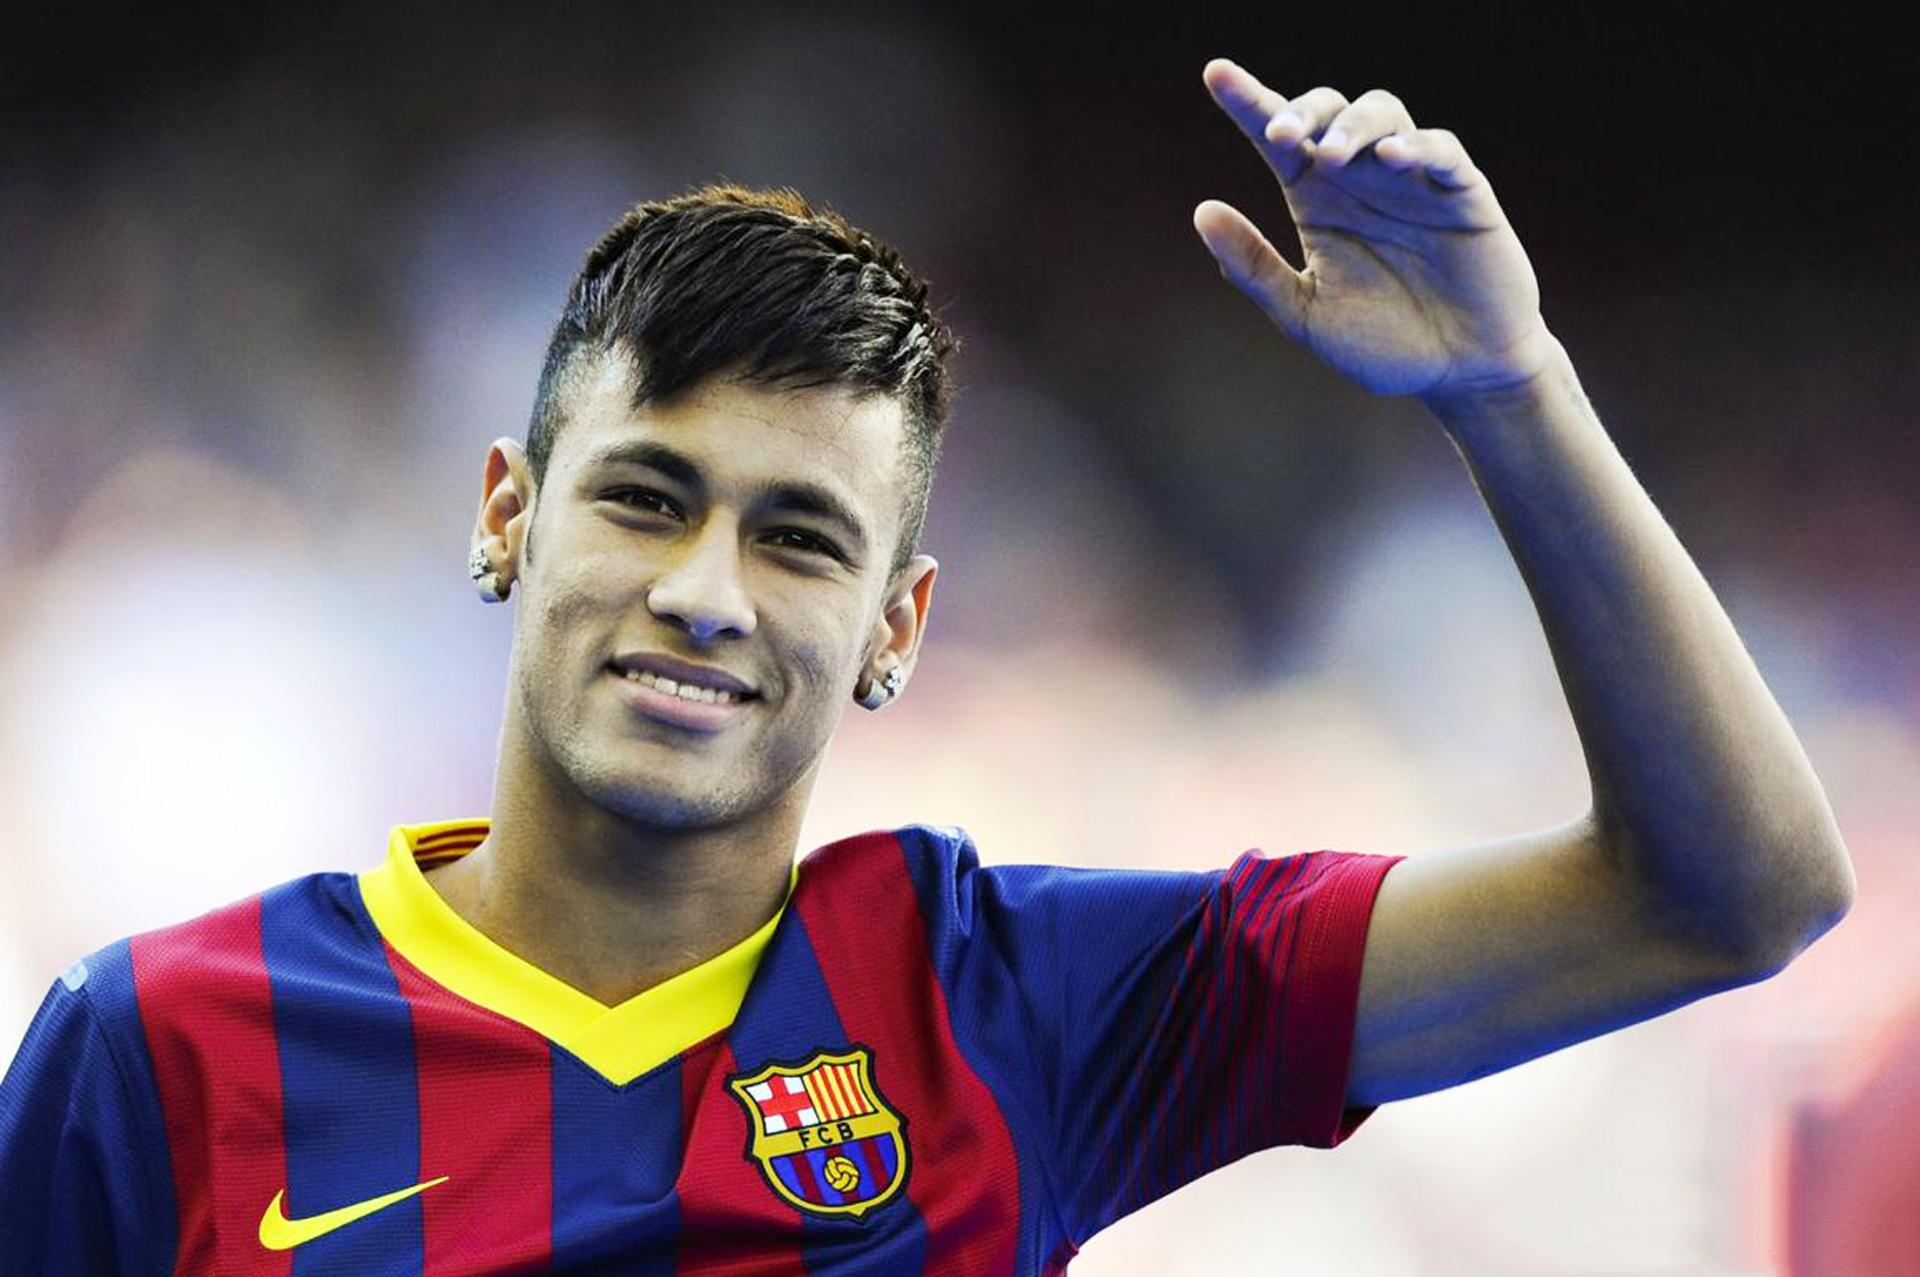 neymar jr documentary credits brazilian s success to his pure joy